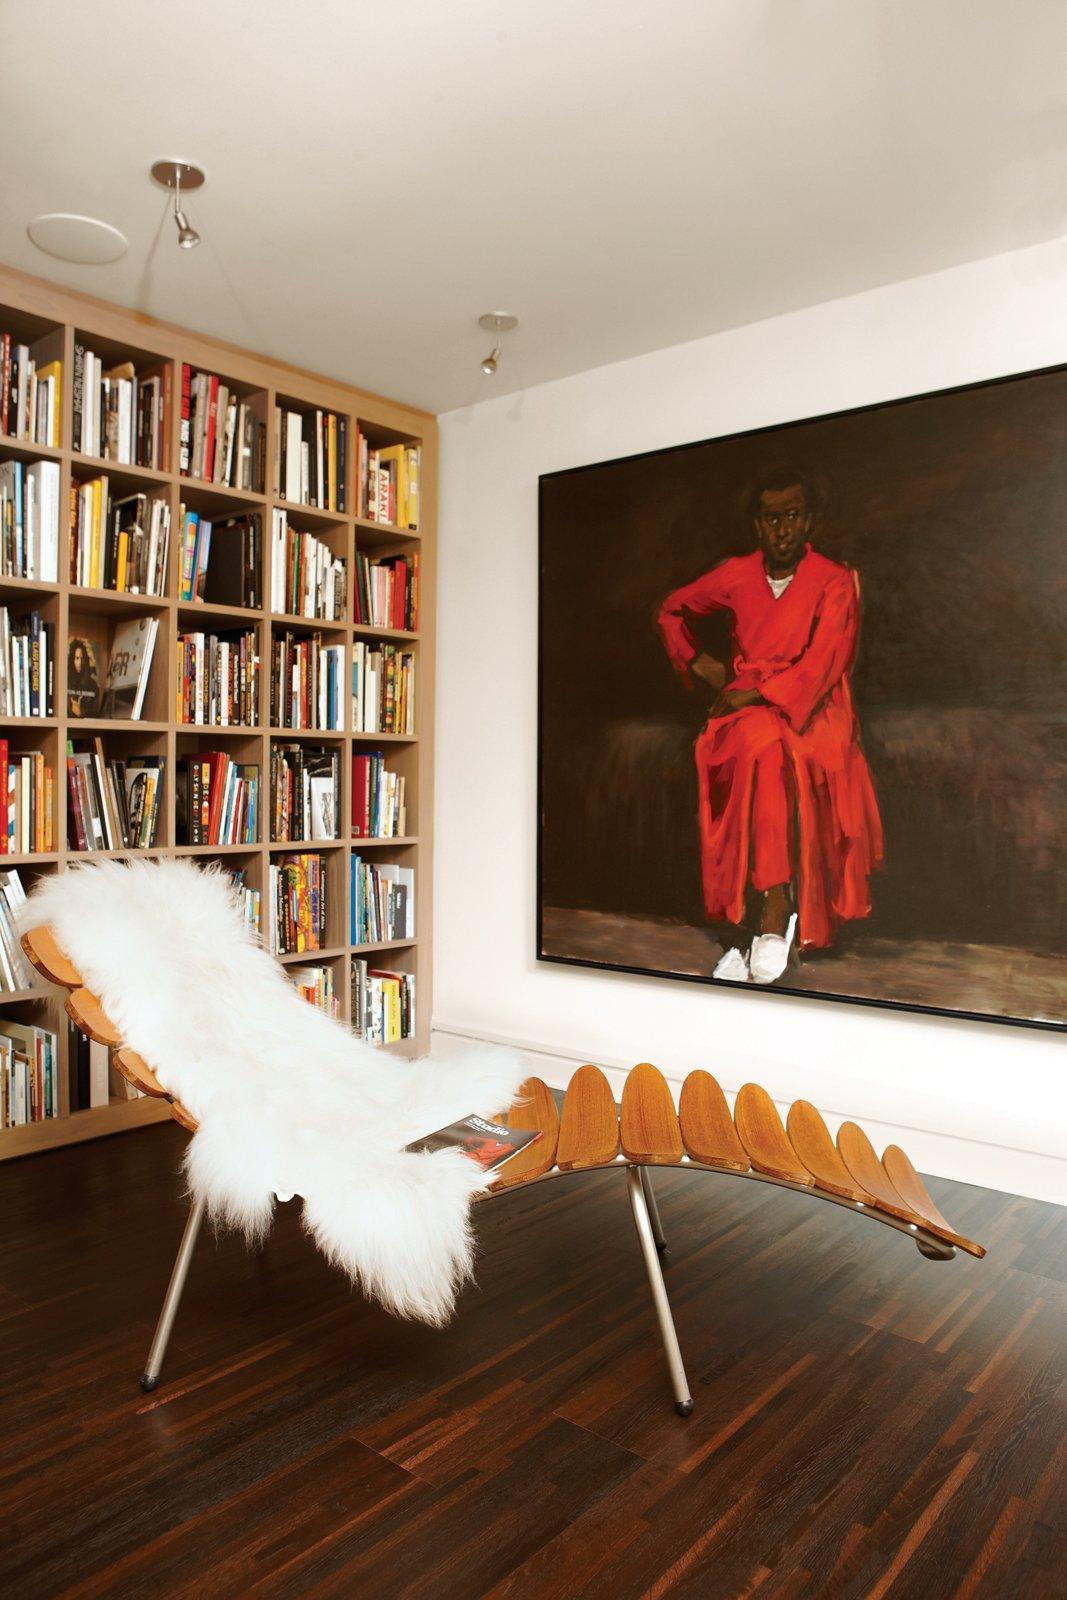 #interior #modern #inside #design #interiordesign #seatingdesign #seating #loungechair #fur #wallart #bookcase #shelving #bookwall #ceilinglight #woodfloor #library #palmslounger #lynetteyiadomboakye #painting #fransschrofer   100+ Best Modern Seating Designs